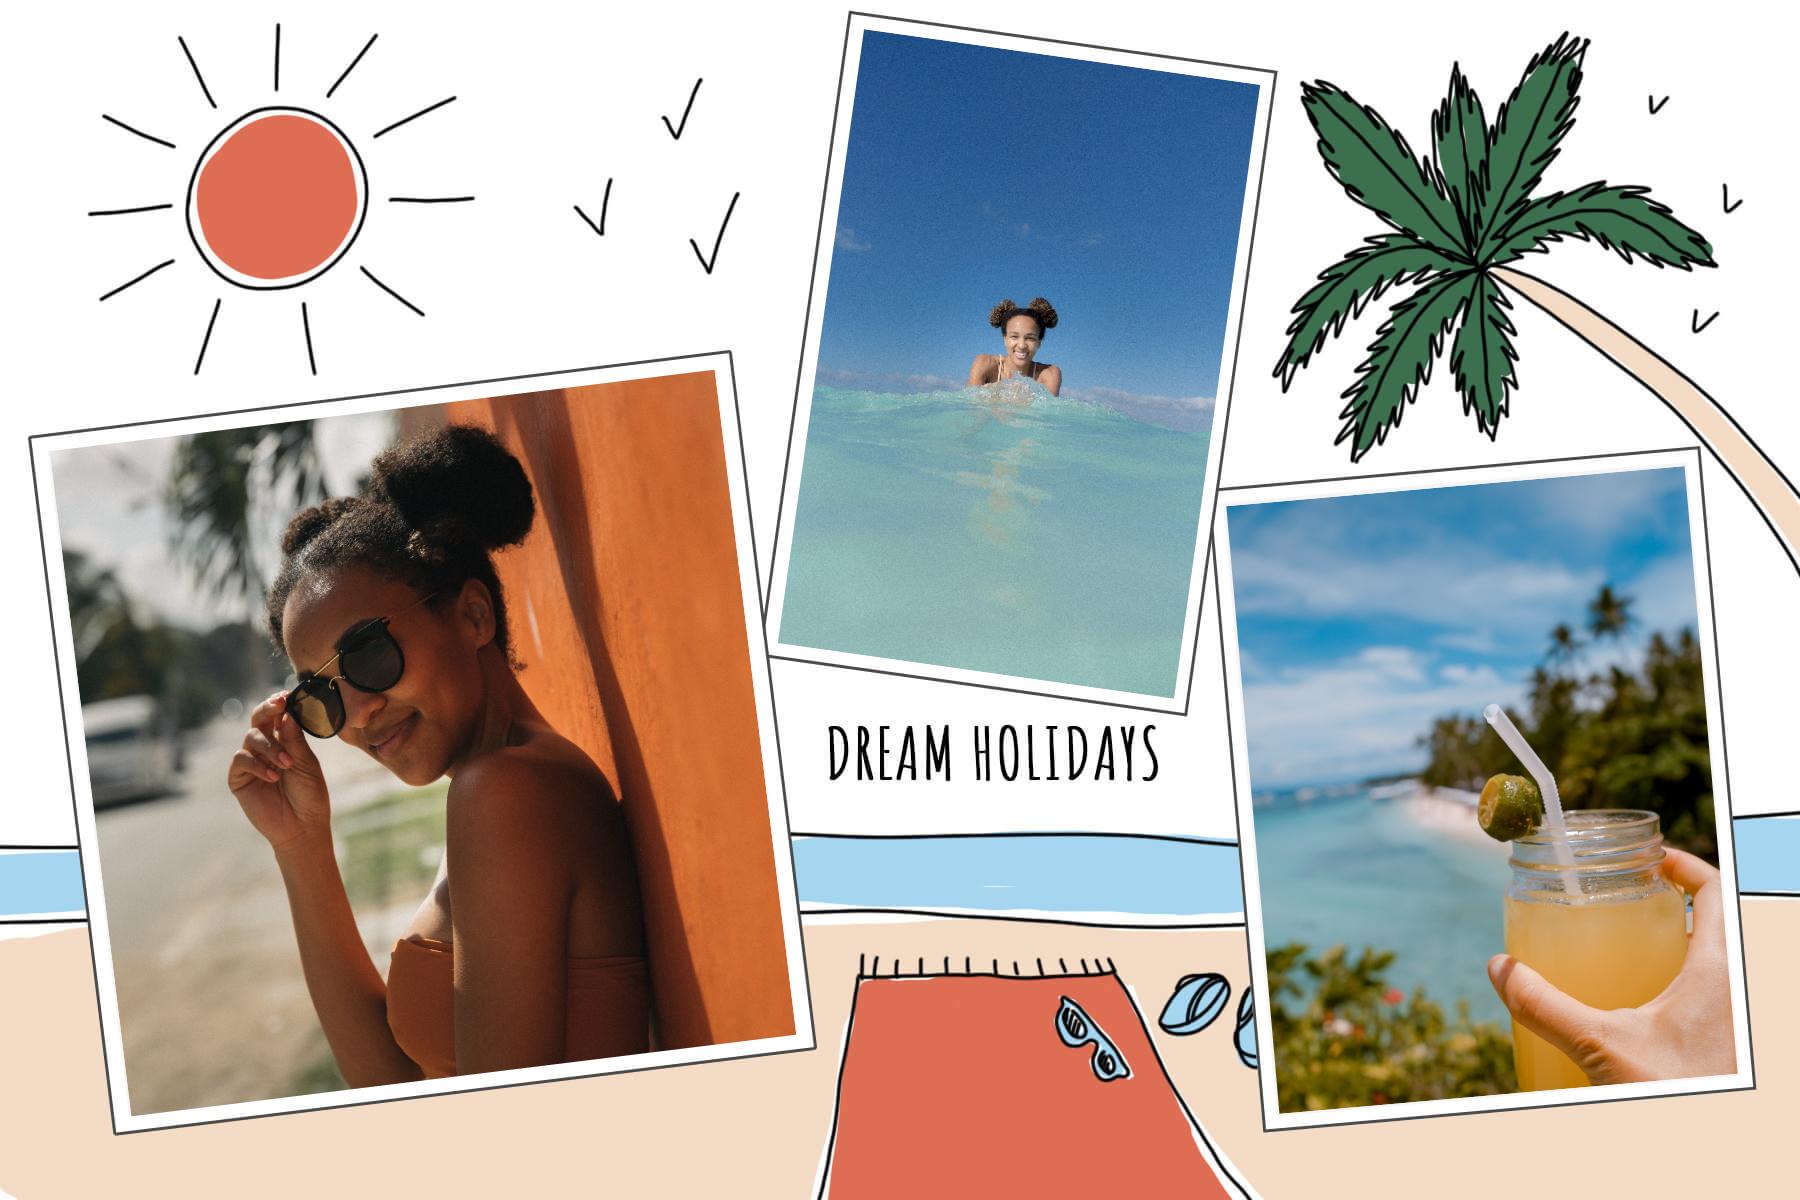 palm tree sun and beach towel